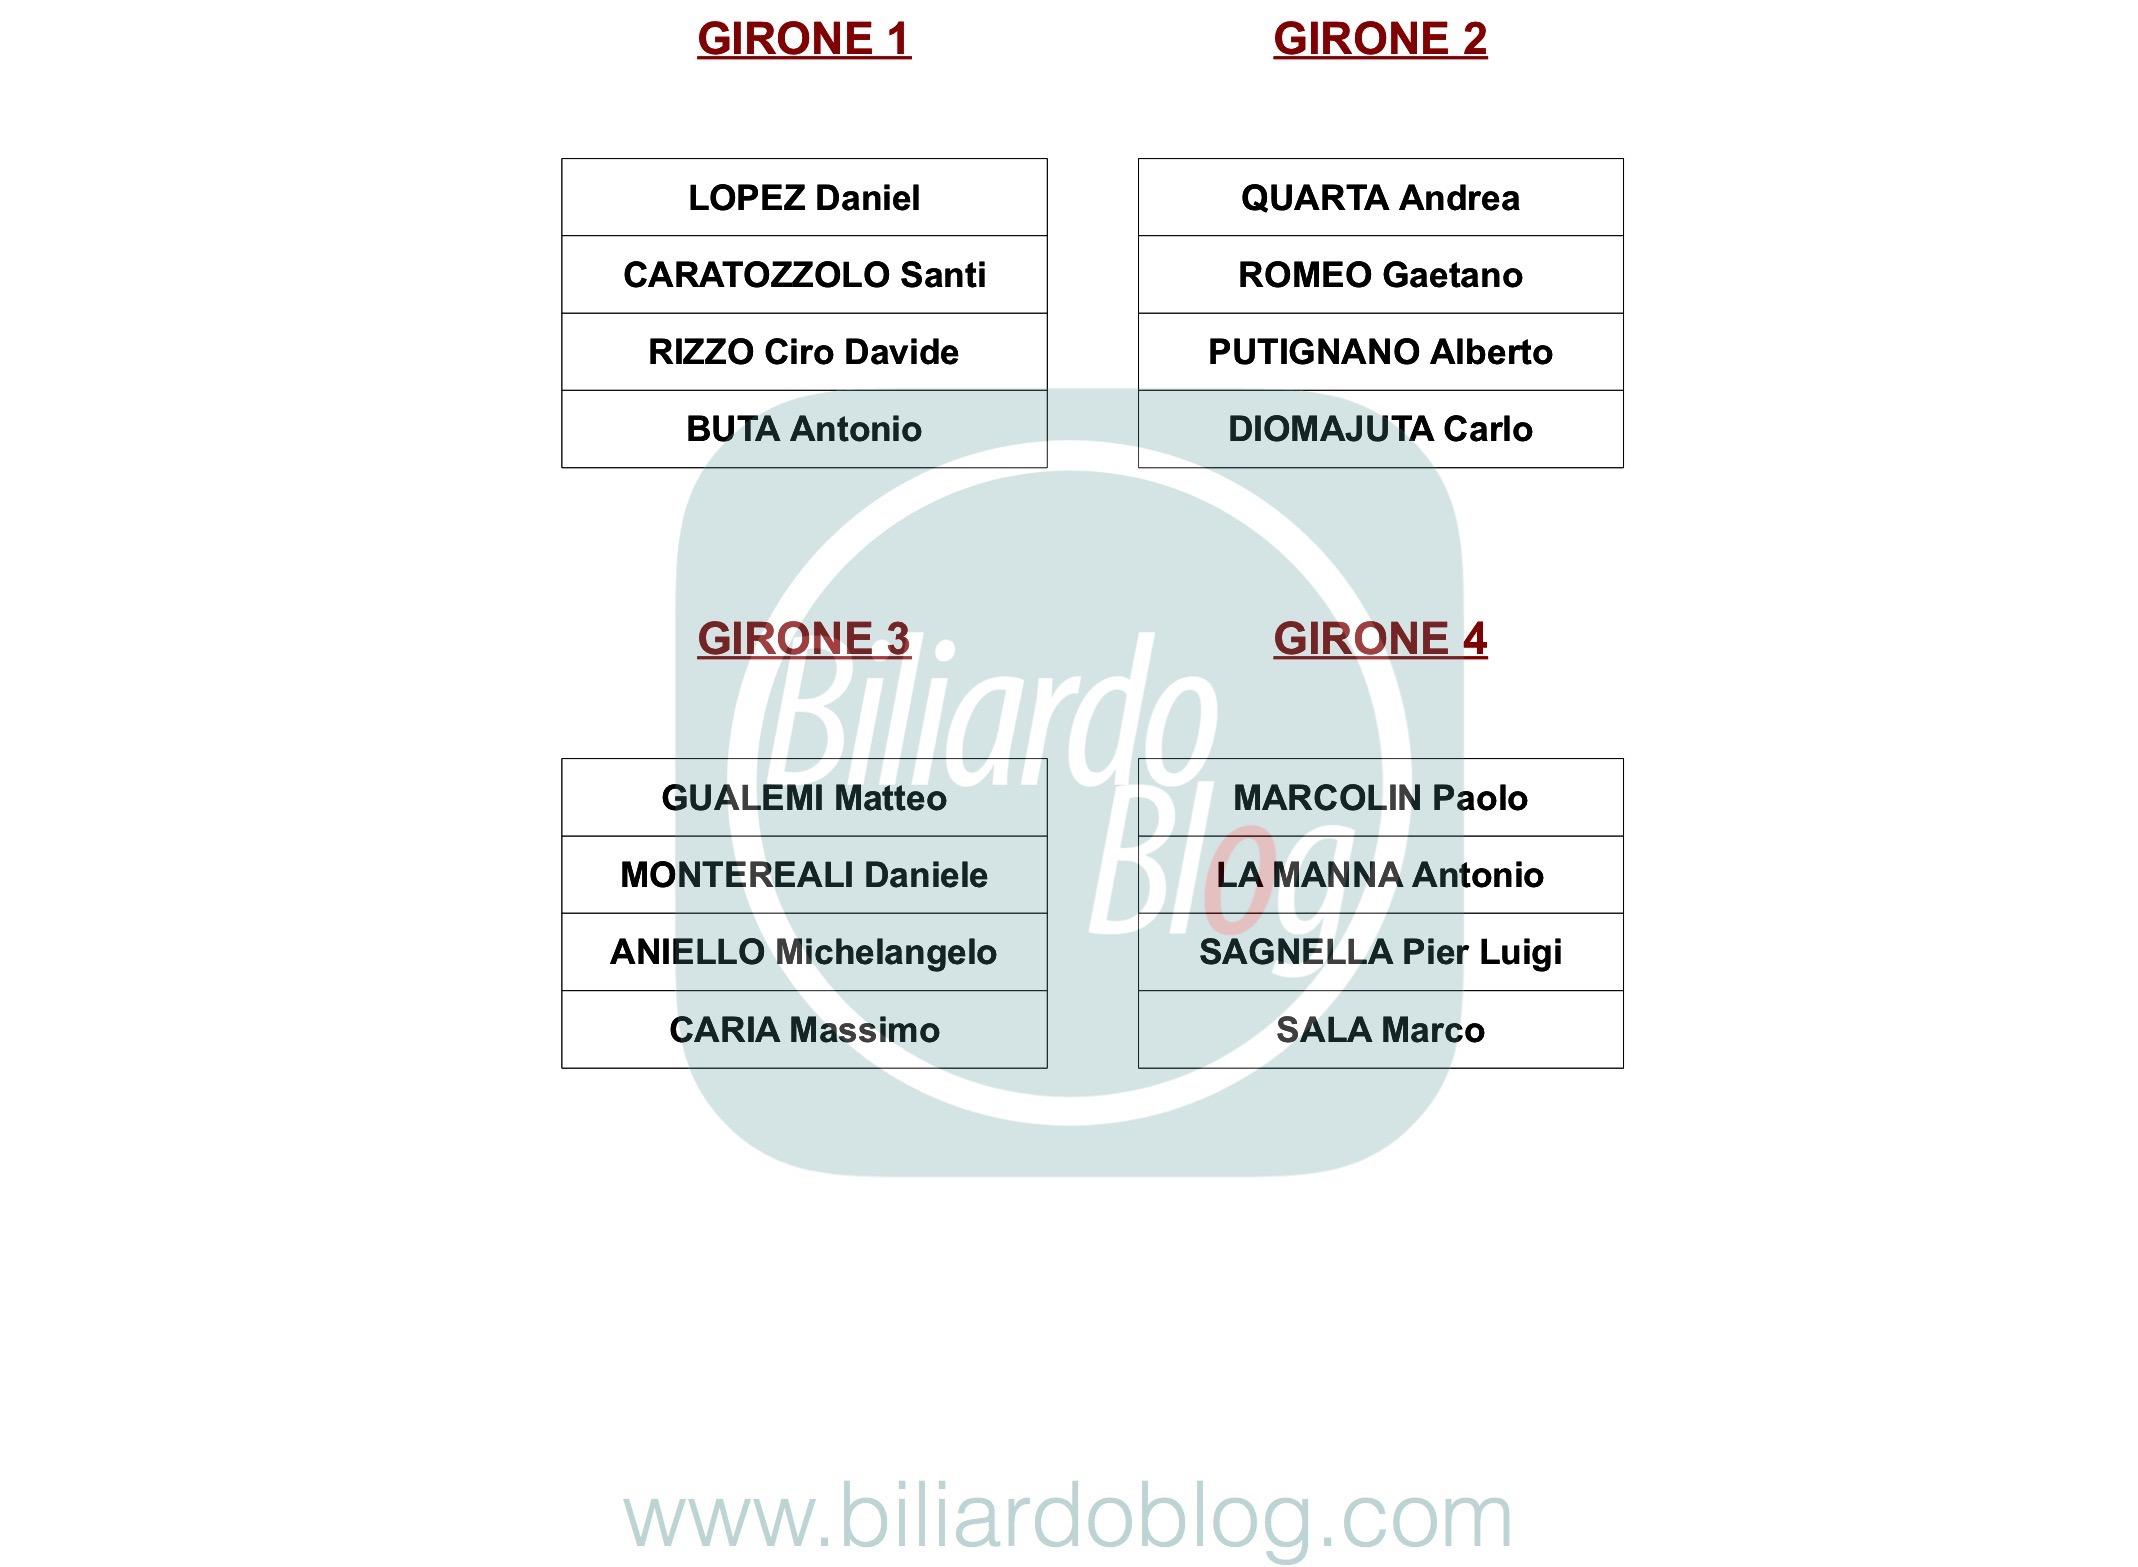 Quarta Tappa Campionato Biliardo 2018 2019: li Gironi Pro